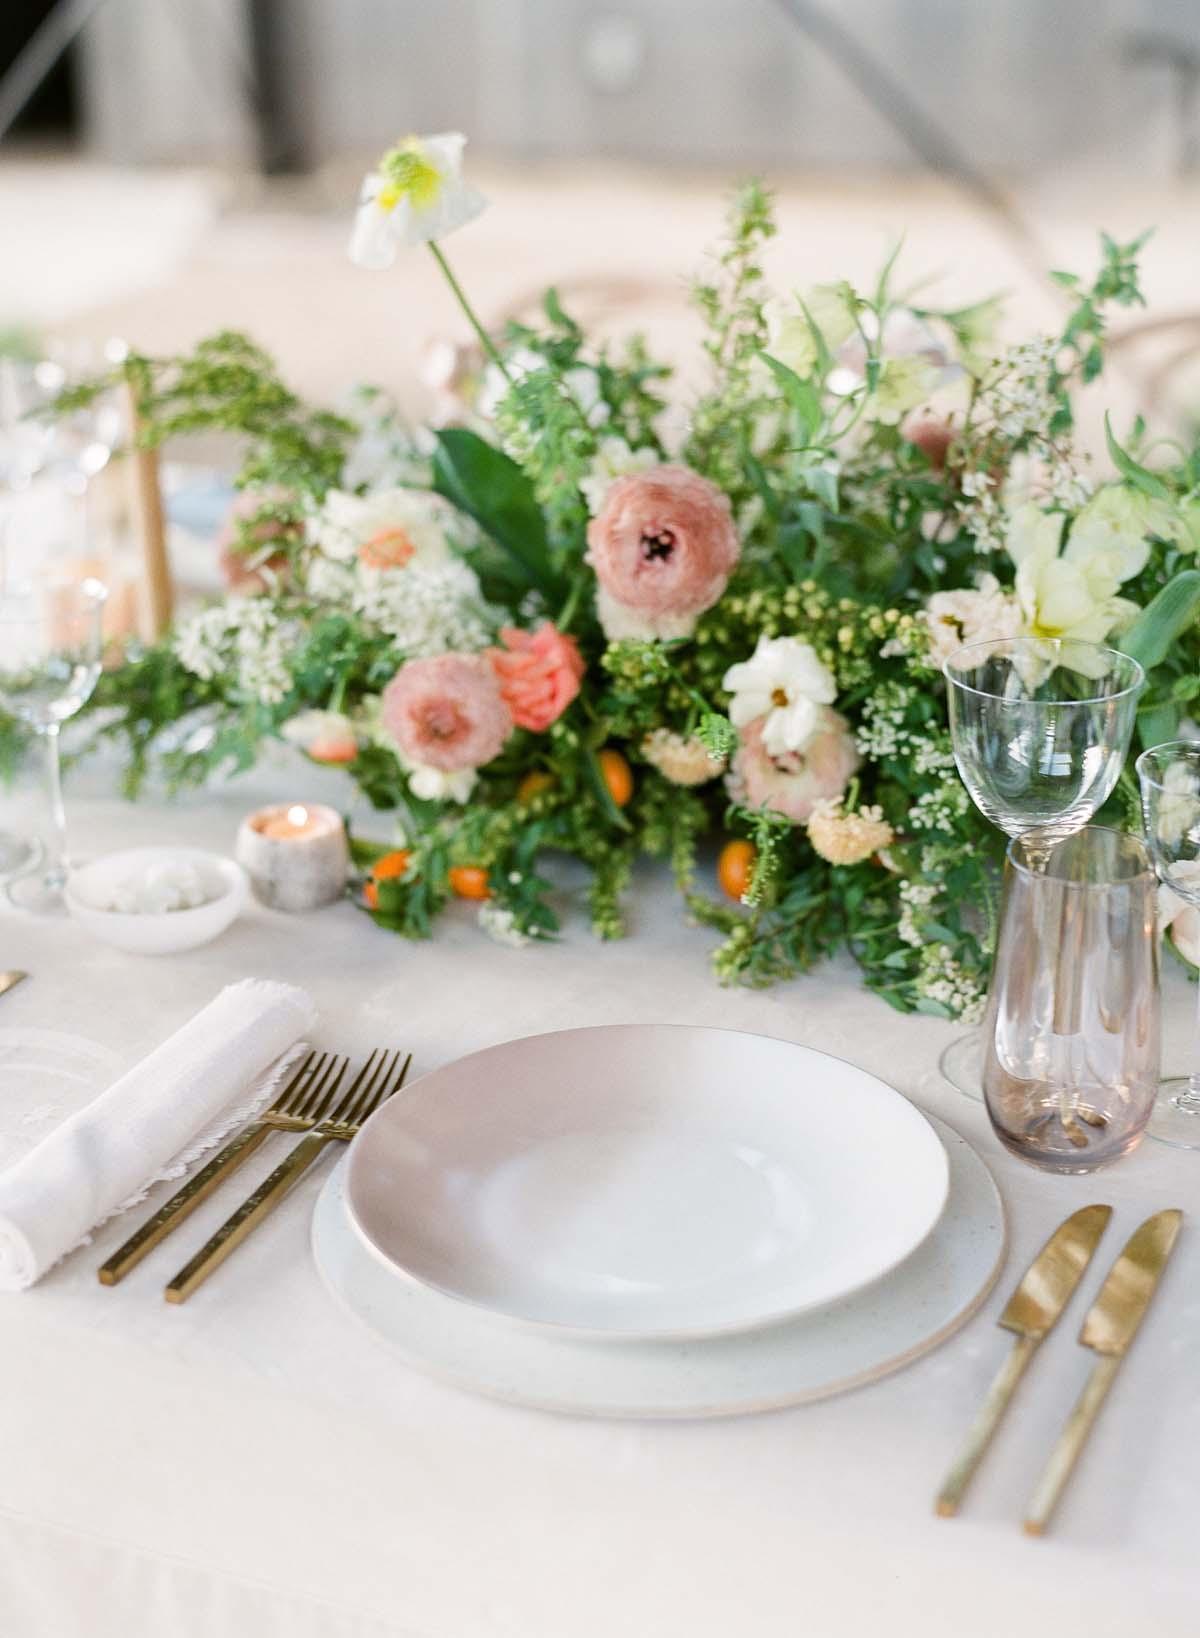 XOXO_BRIDE_Events-Michelle-Beller_Photography_0148